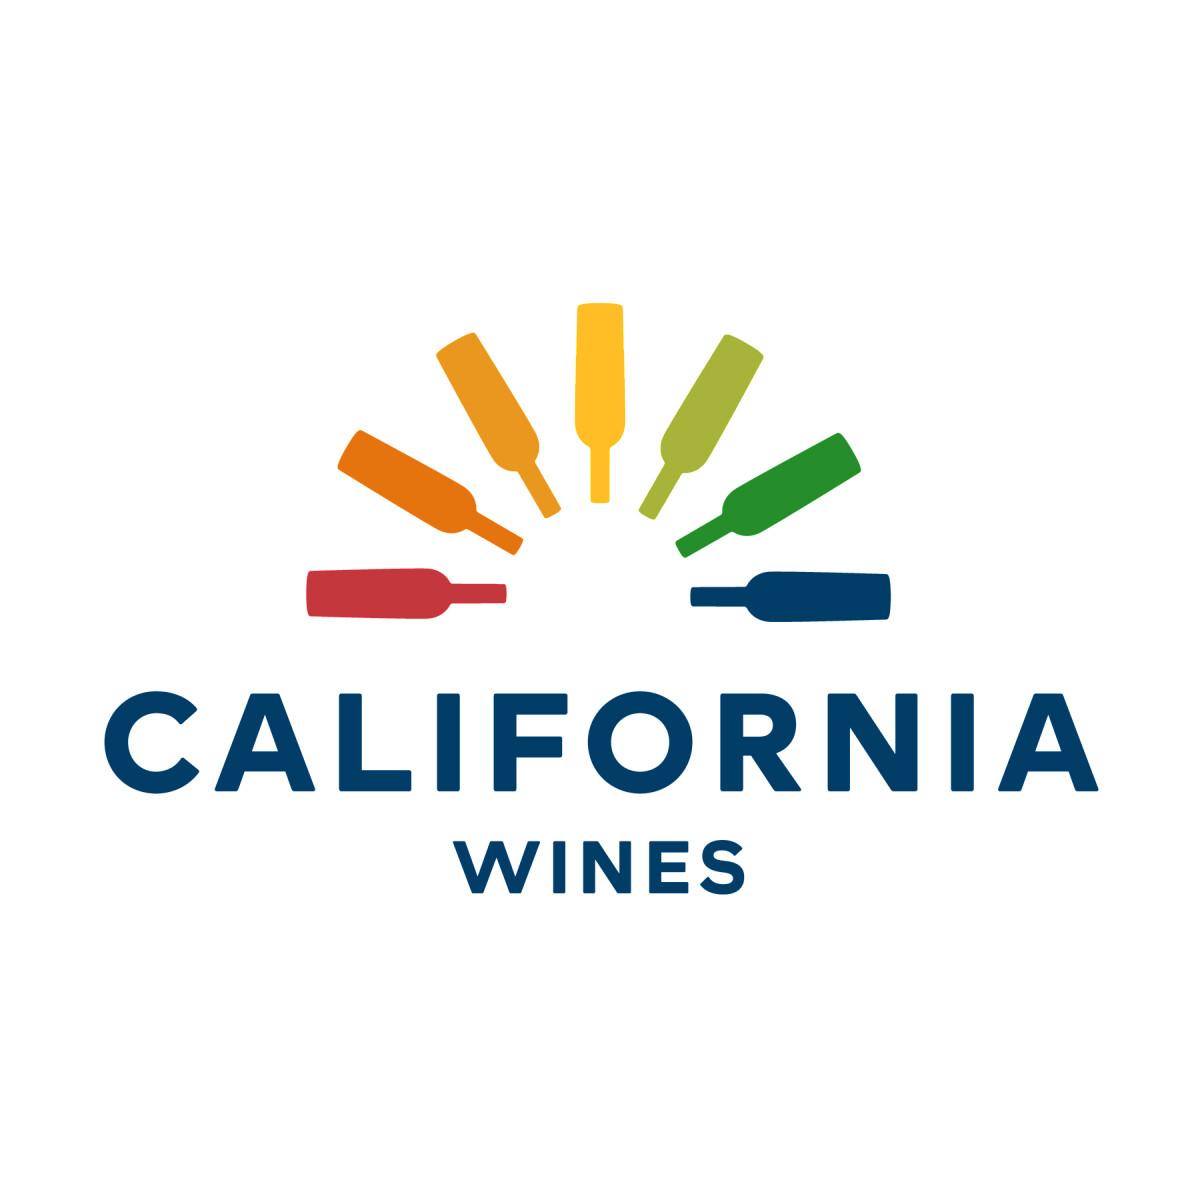 California_Wines_Logo_Final_postive_live.jpg [49.97 KB]